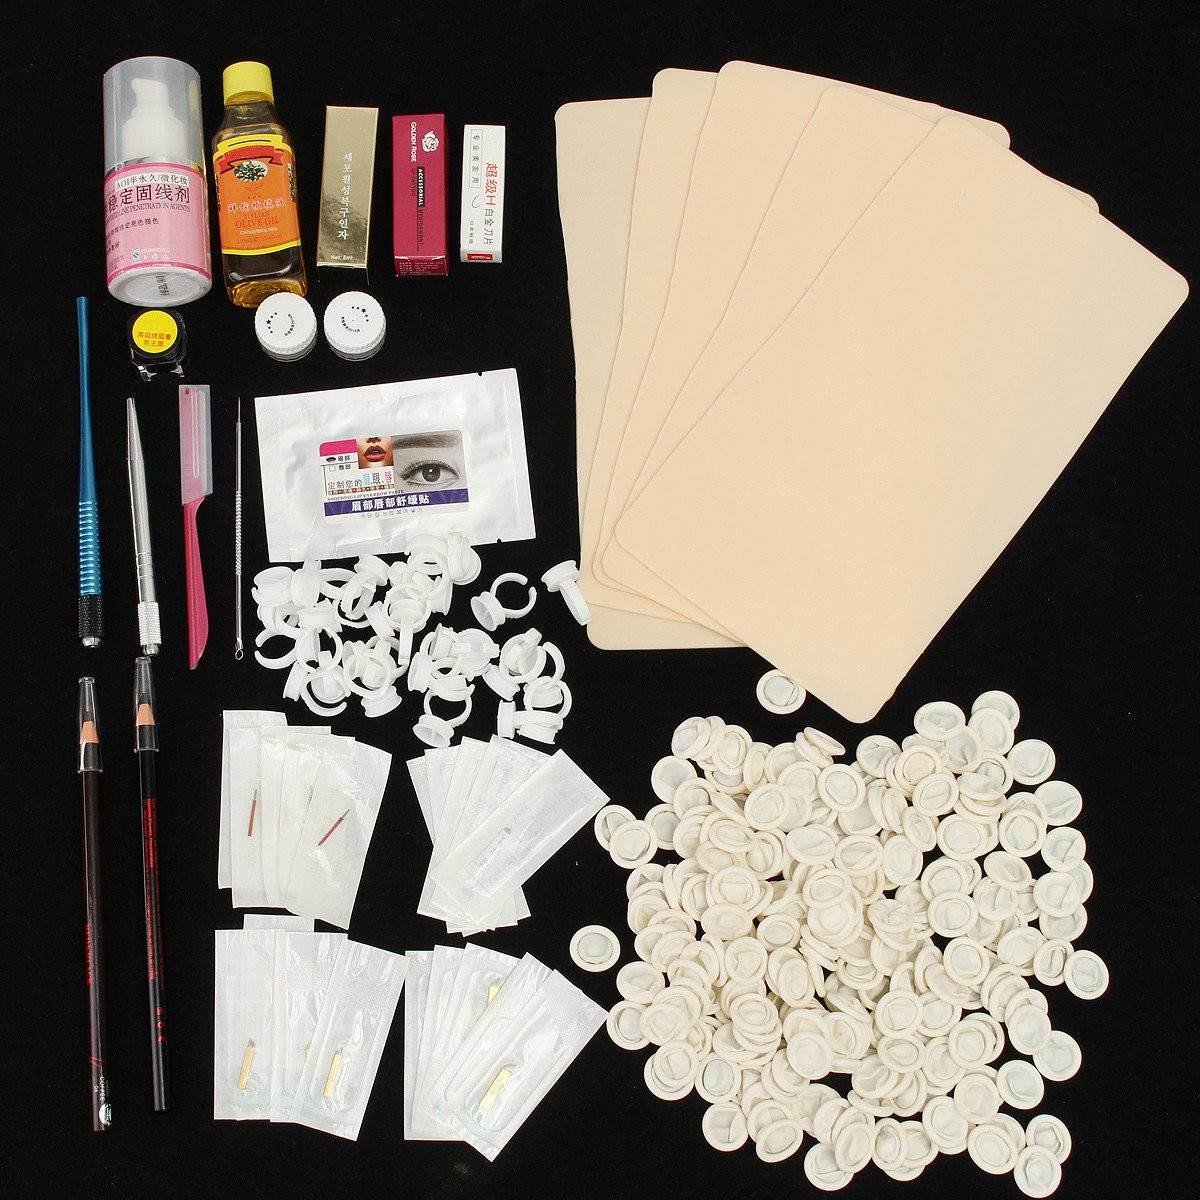 Microblading Eyebrow Kit Permanent Makeup Machine Tattoo Eyebrow Tattoo Pen Needle Paste Skin Essence Tool For Learner User